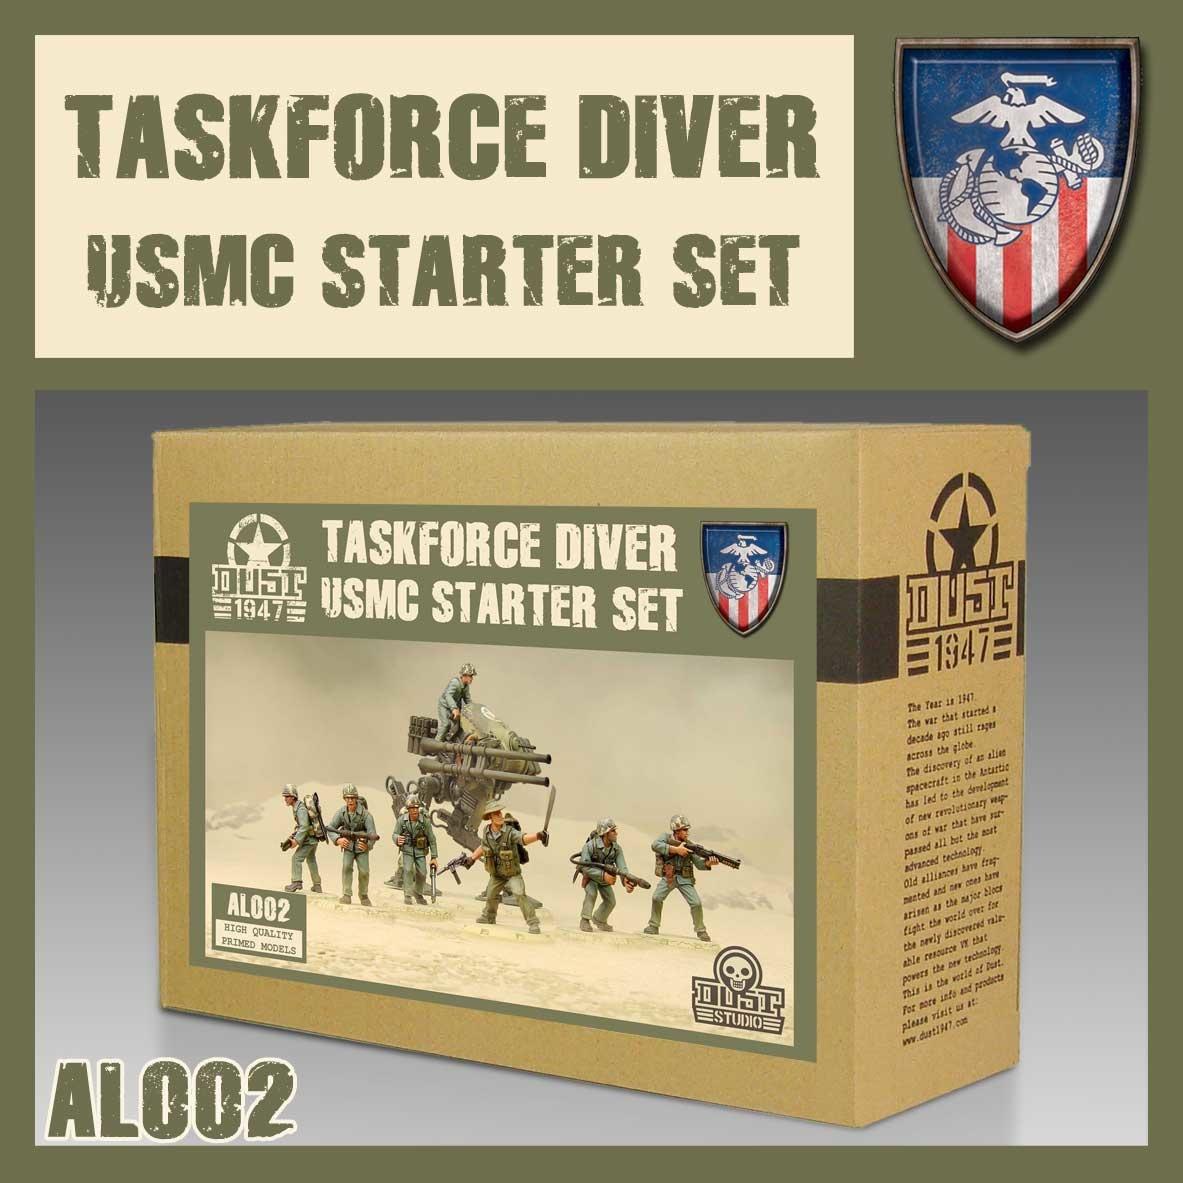 DUST USA DUST DROP-SHIP: USMC Starter Set - Taskforce Diver